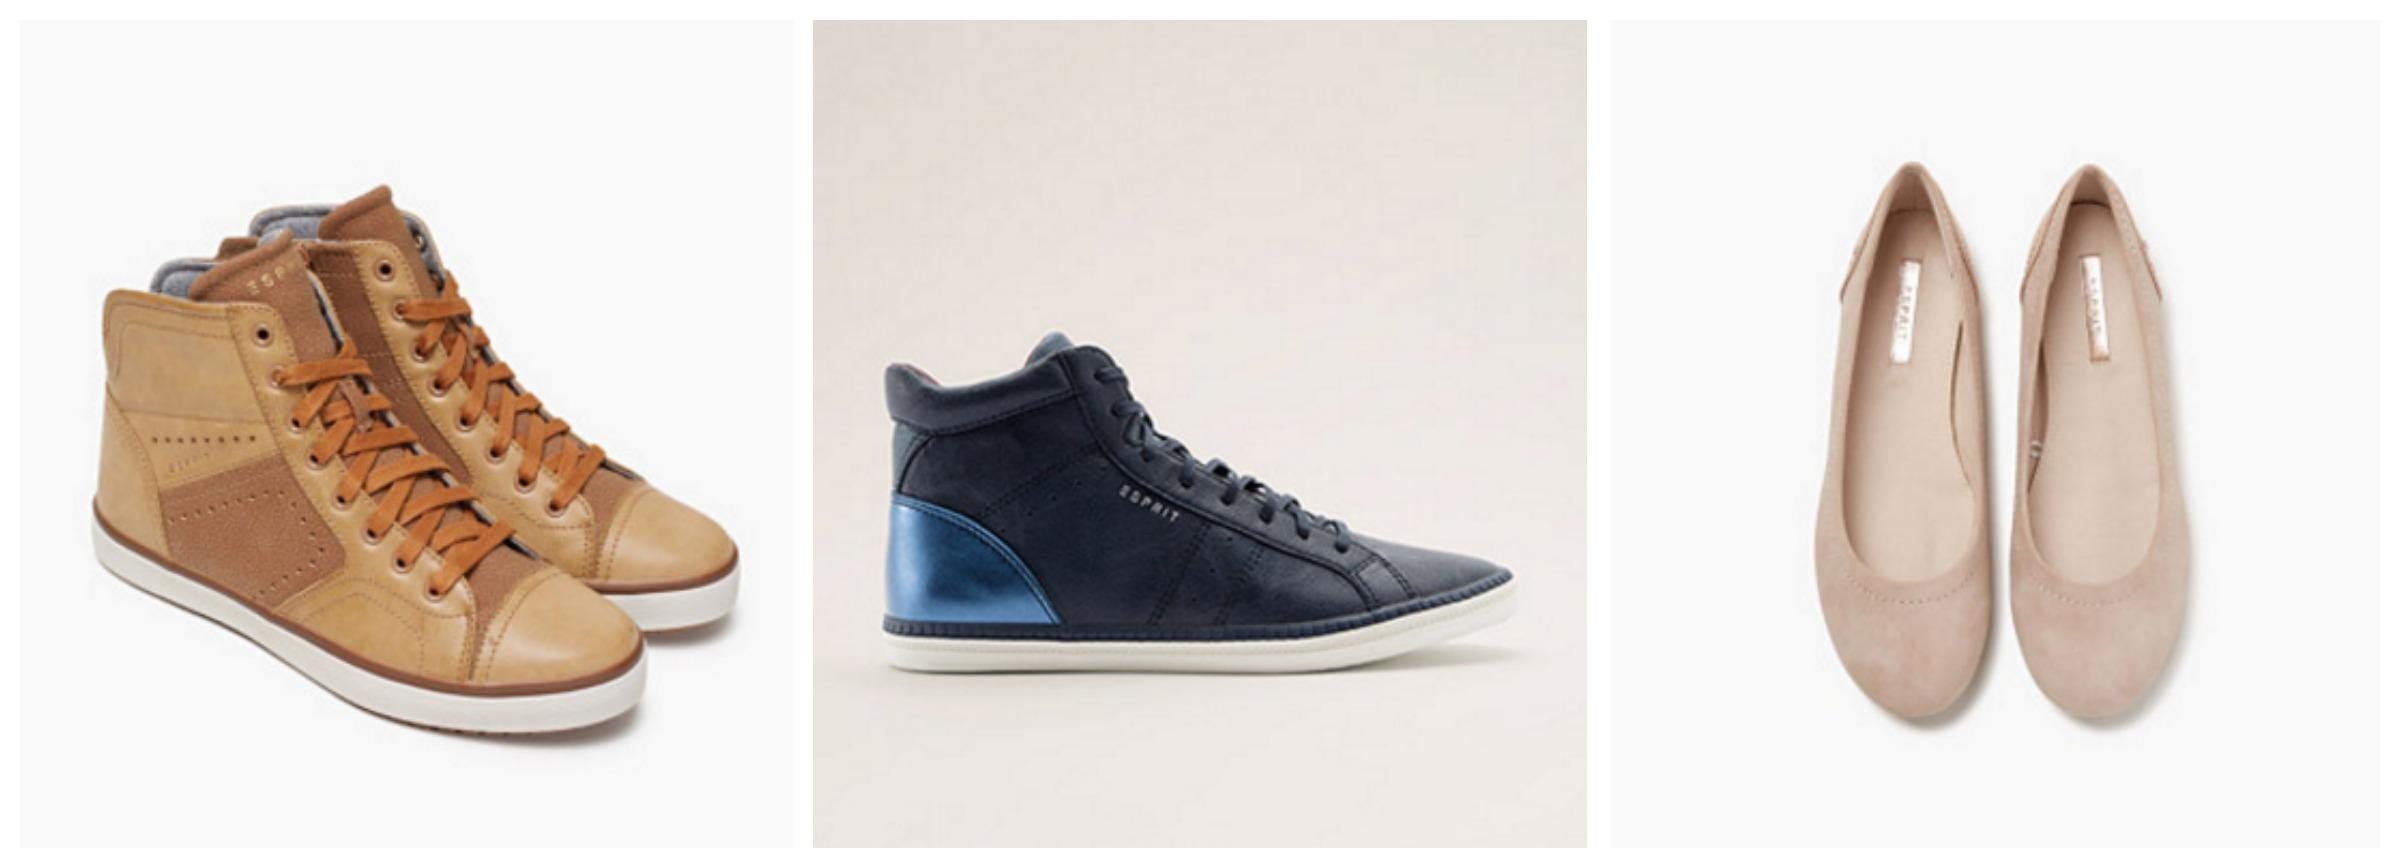 5 marques de chaussures vegan bordelaise by mimi. Black Bedroom Furniture Sets. Home Design Ideas